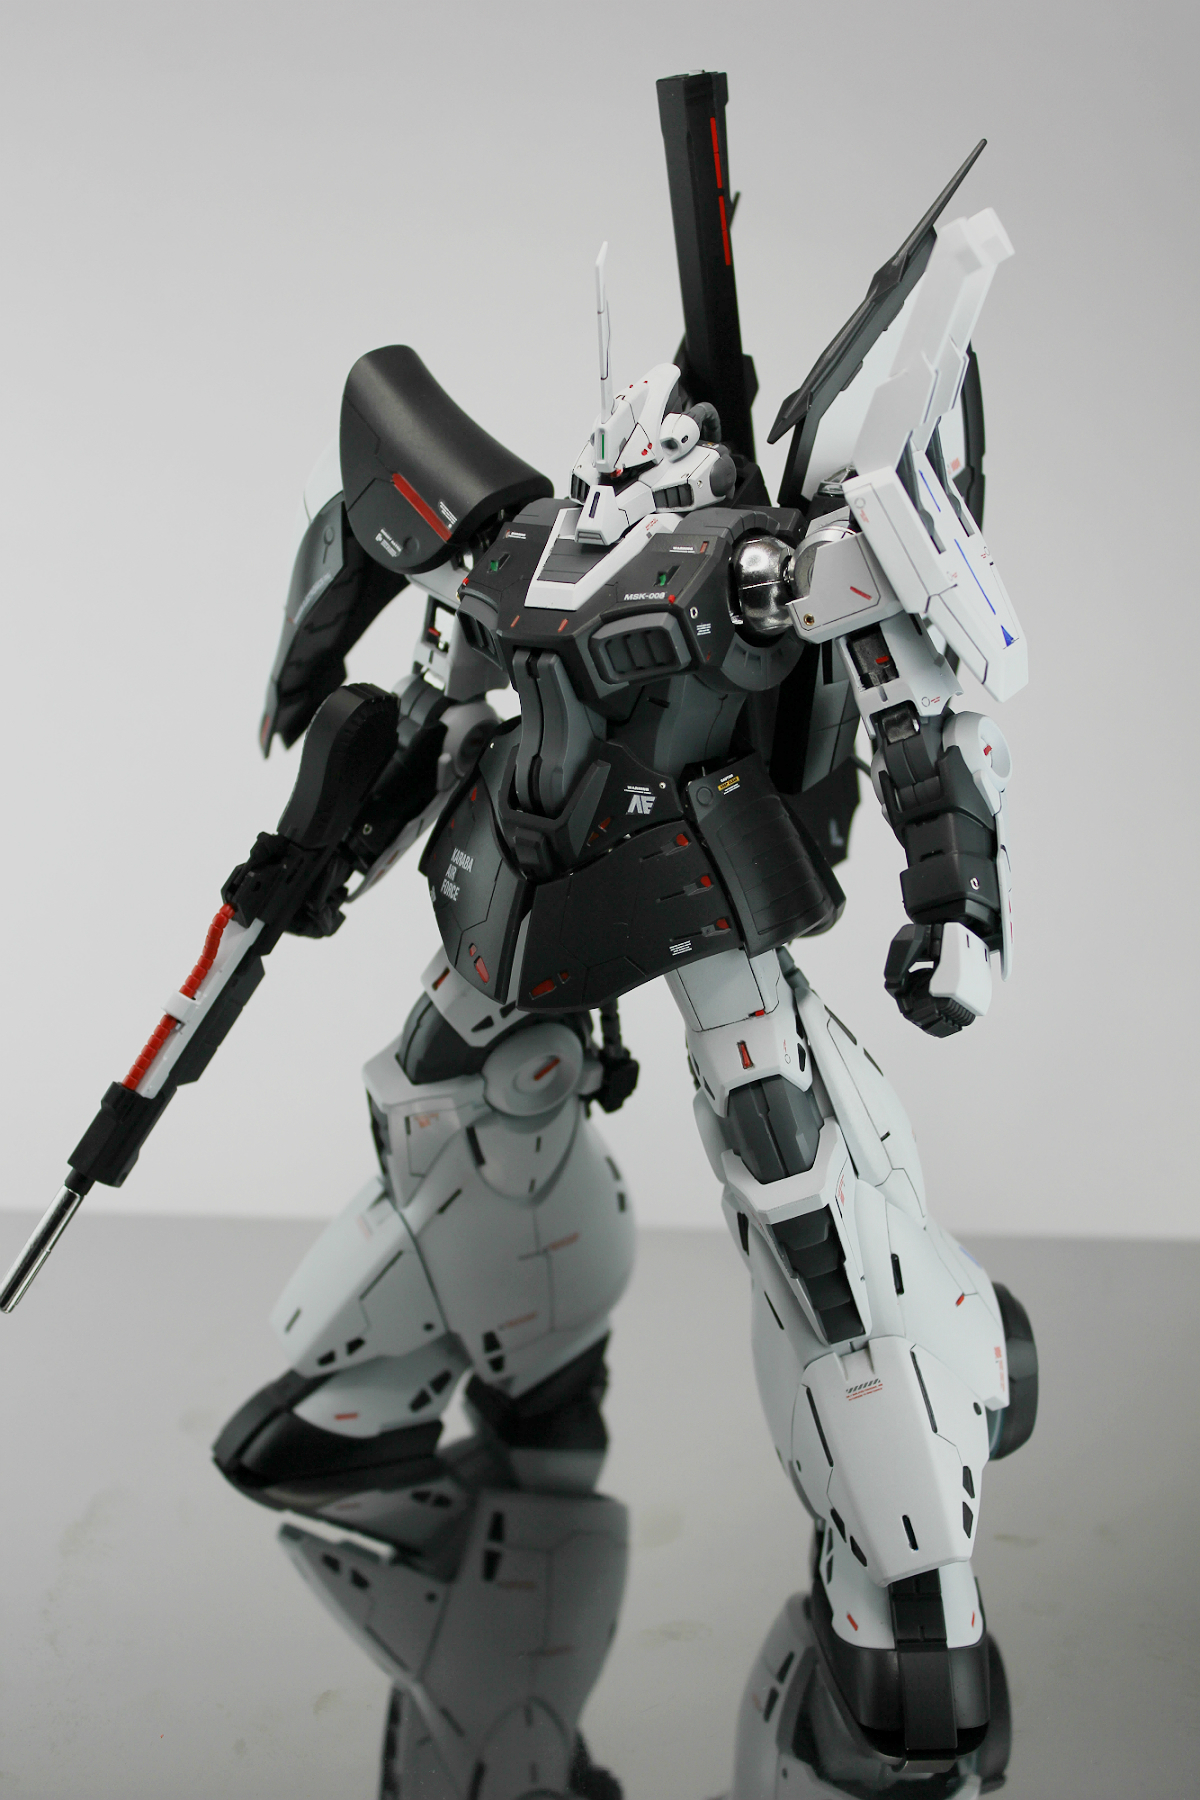 Robotunit8